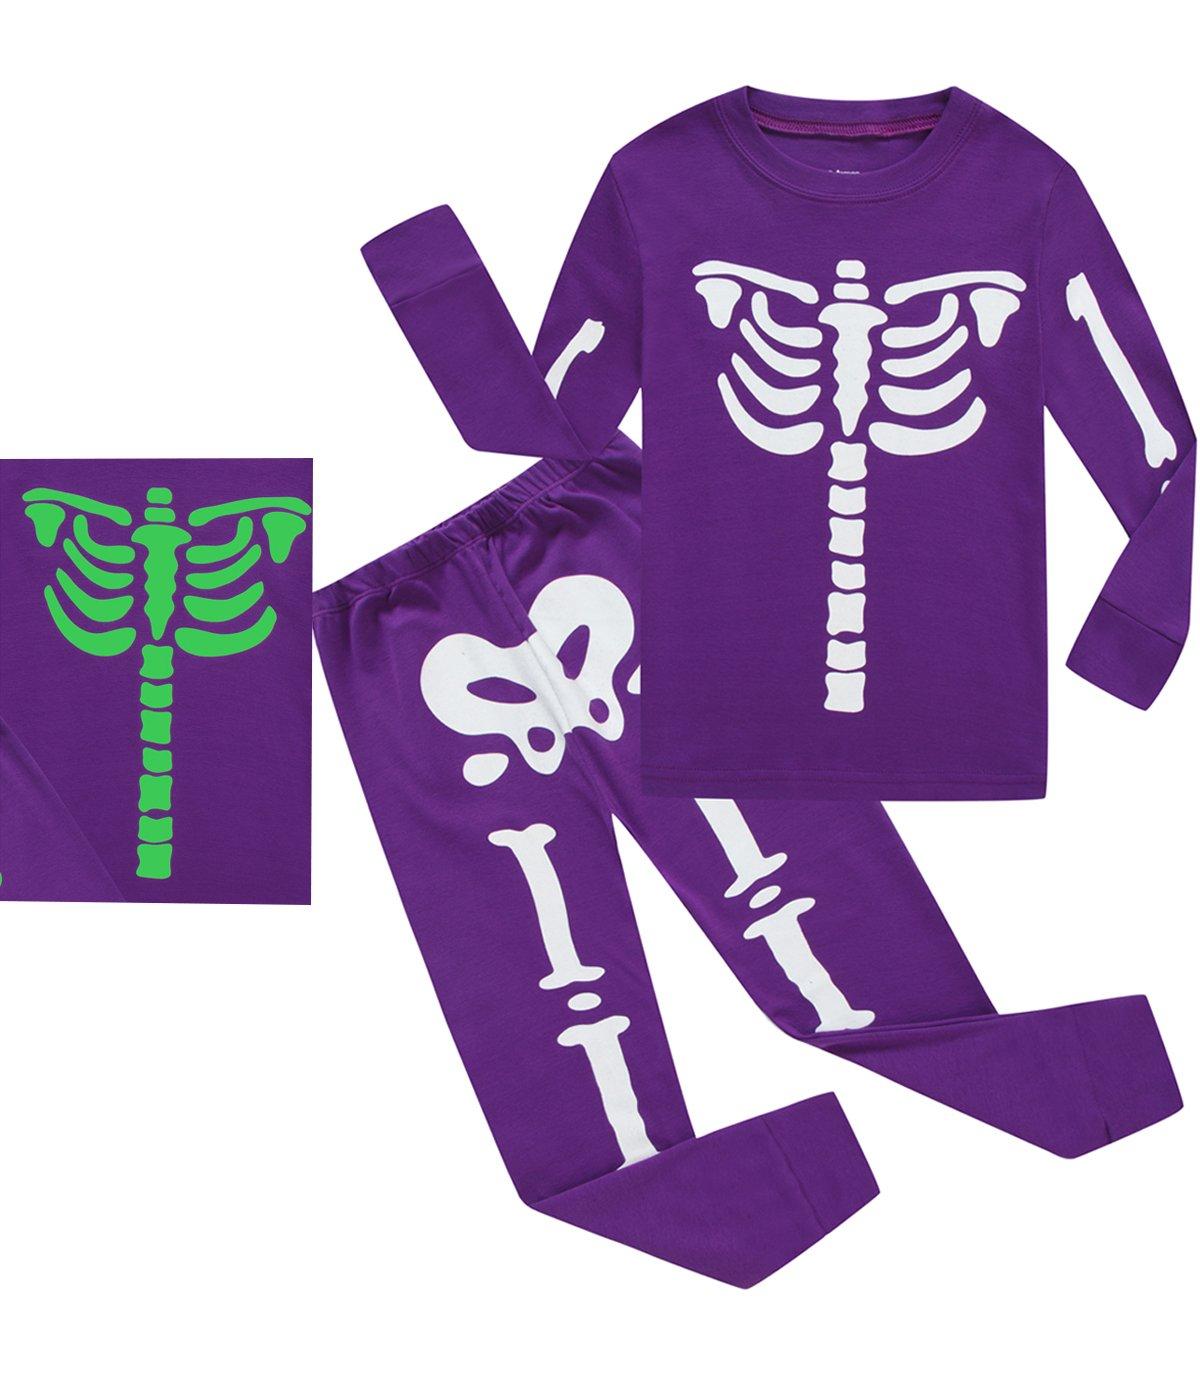 Little Pajamas Boys Girls Skeleton Halloween 100% Cotton Toddler Clothes Kids Sleepwear Size 3